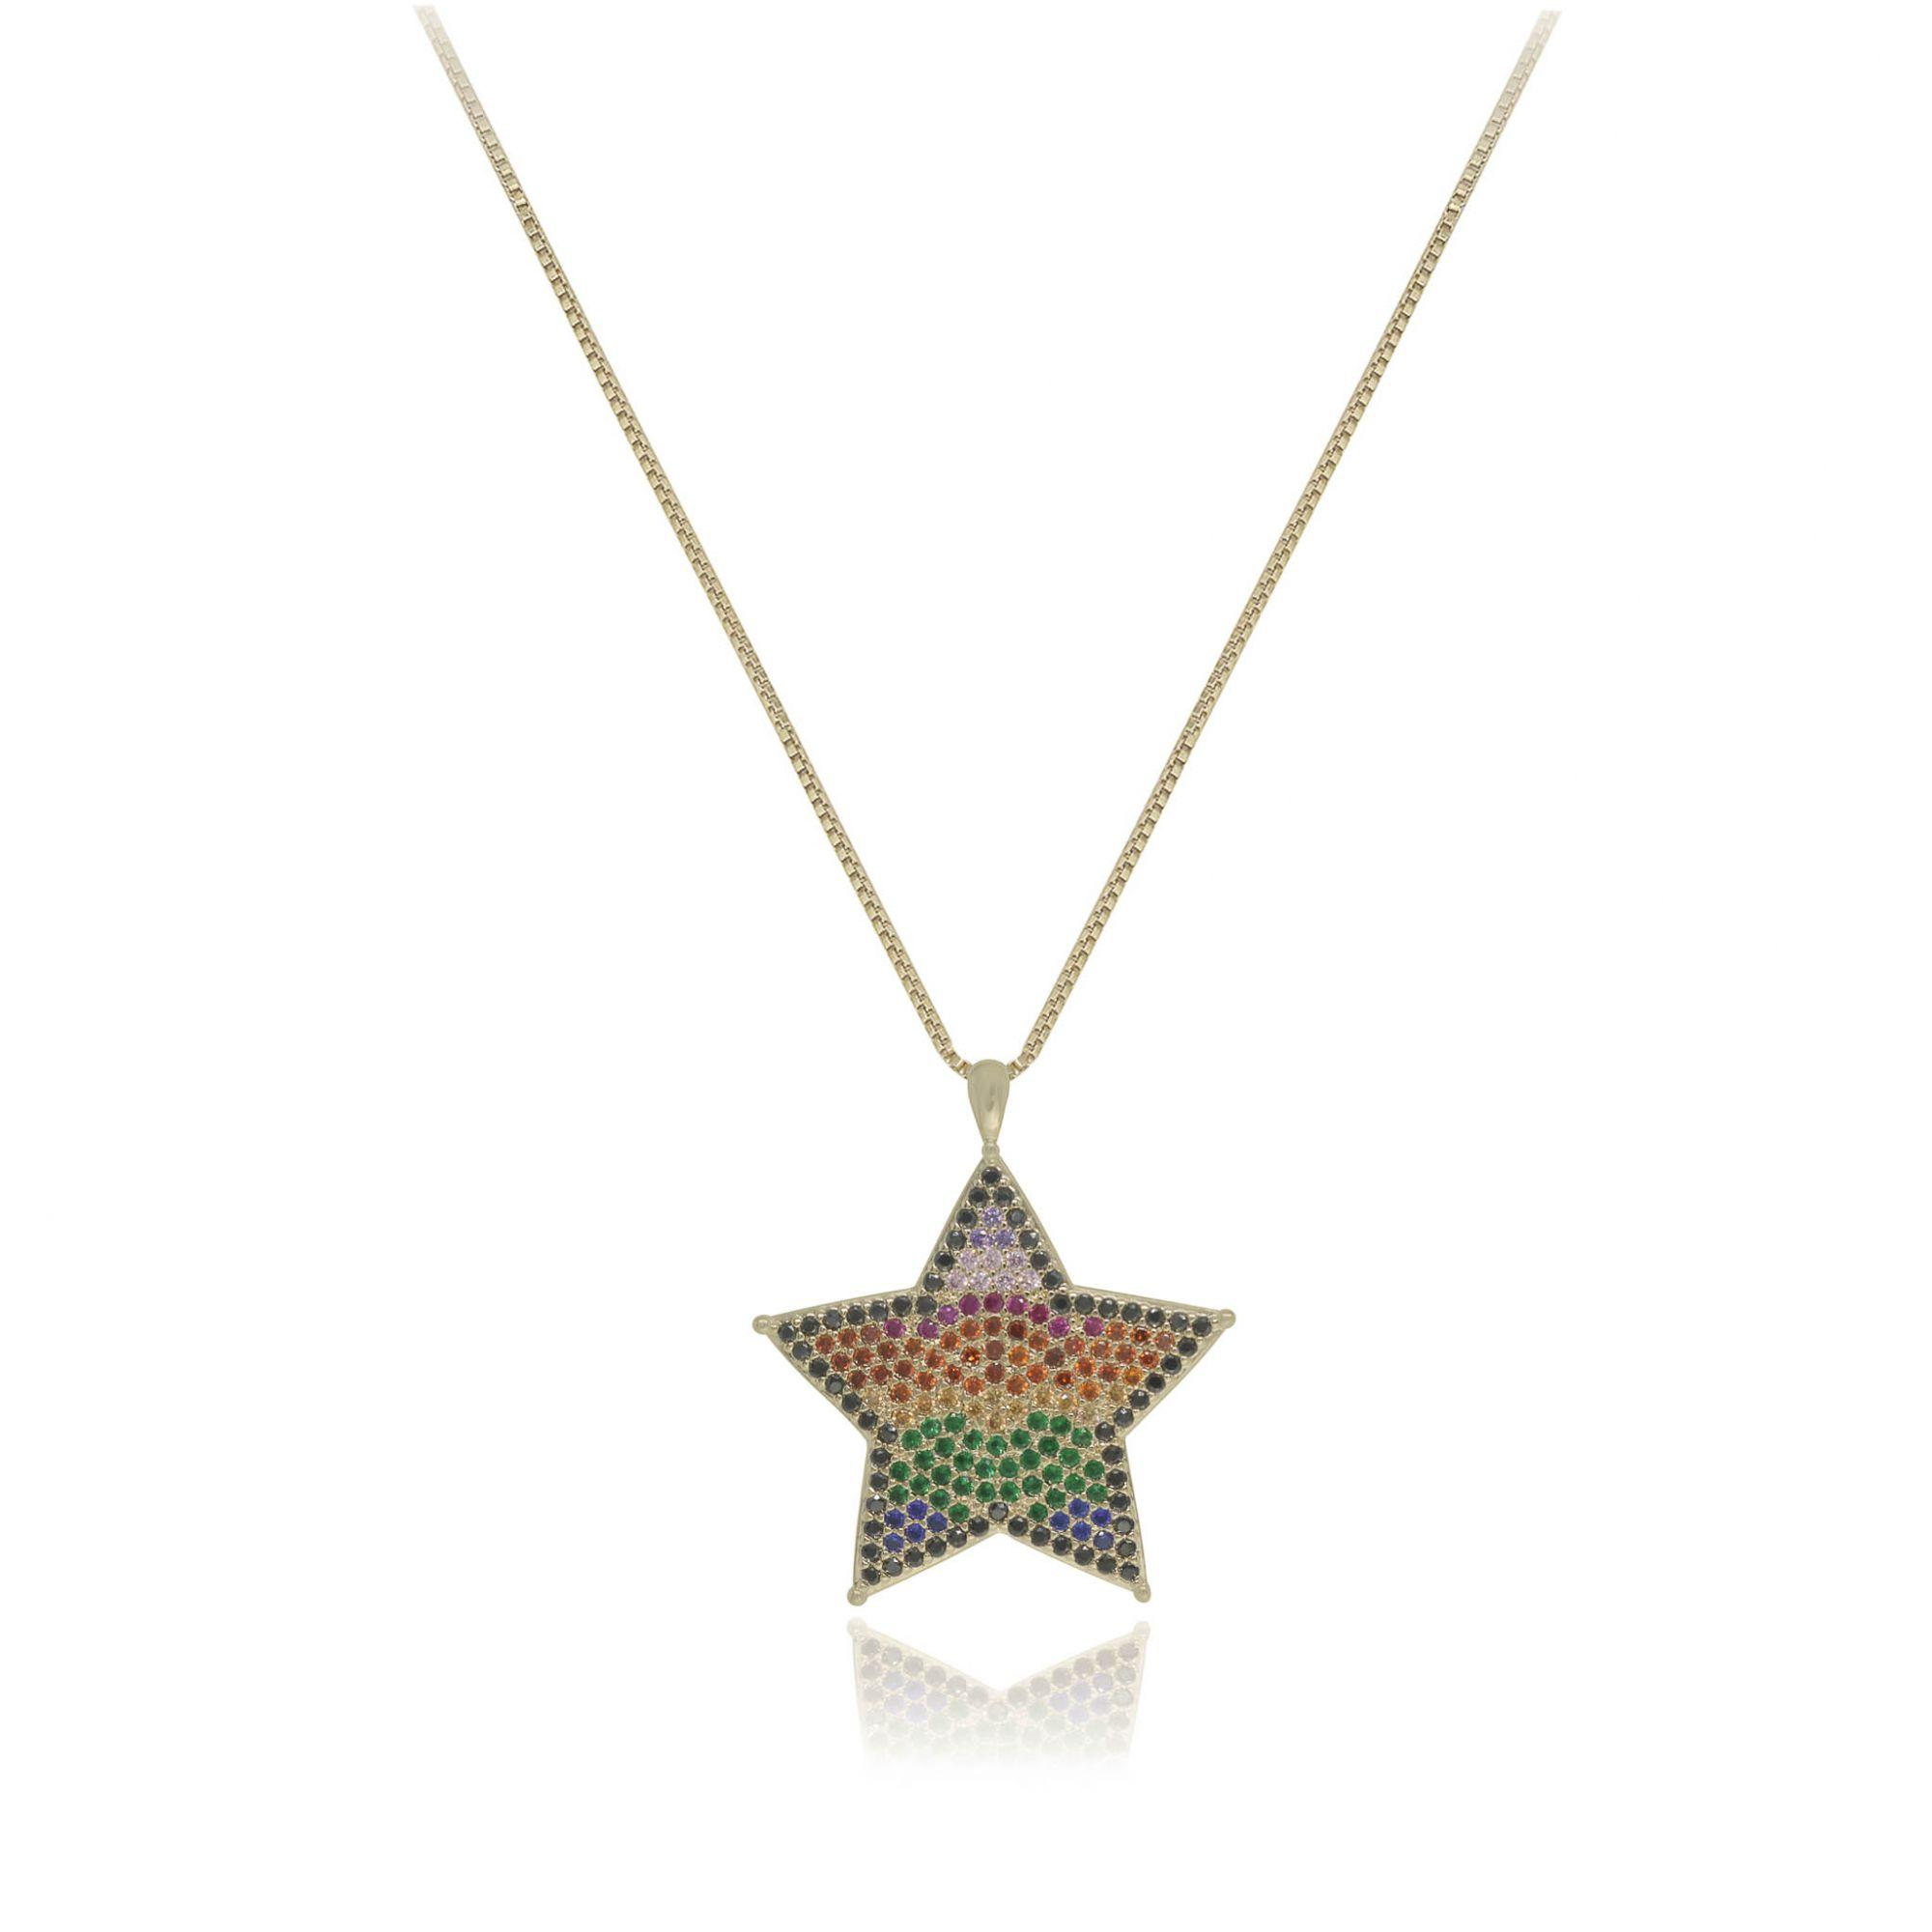 Colar folheado semijoia cravejada em zirconia color Estrela